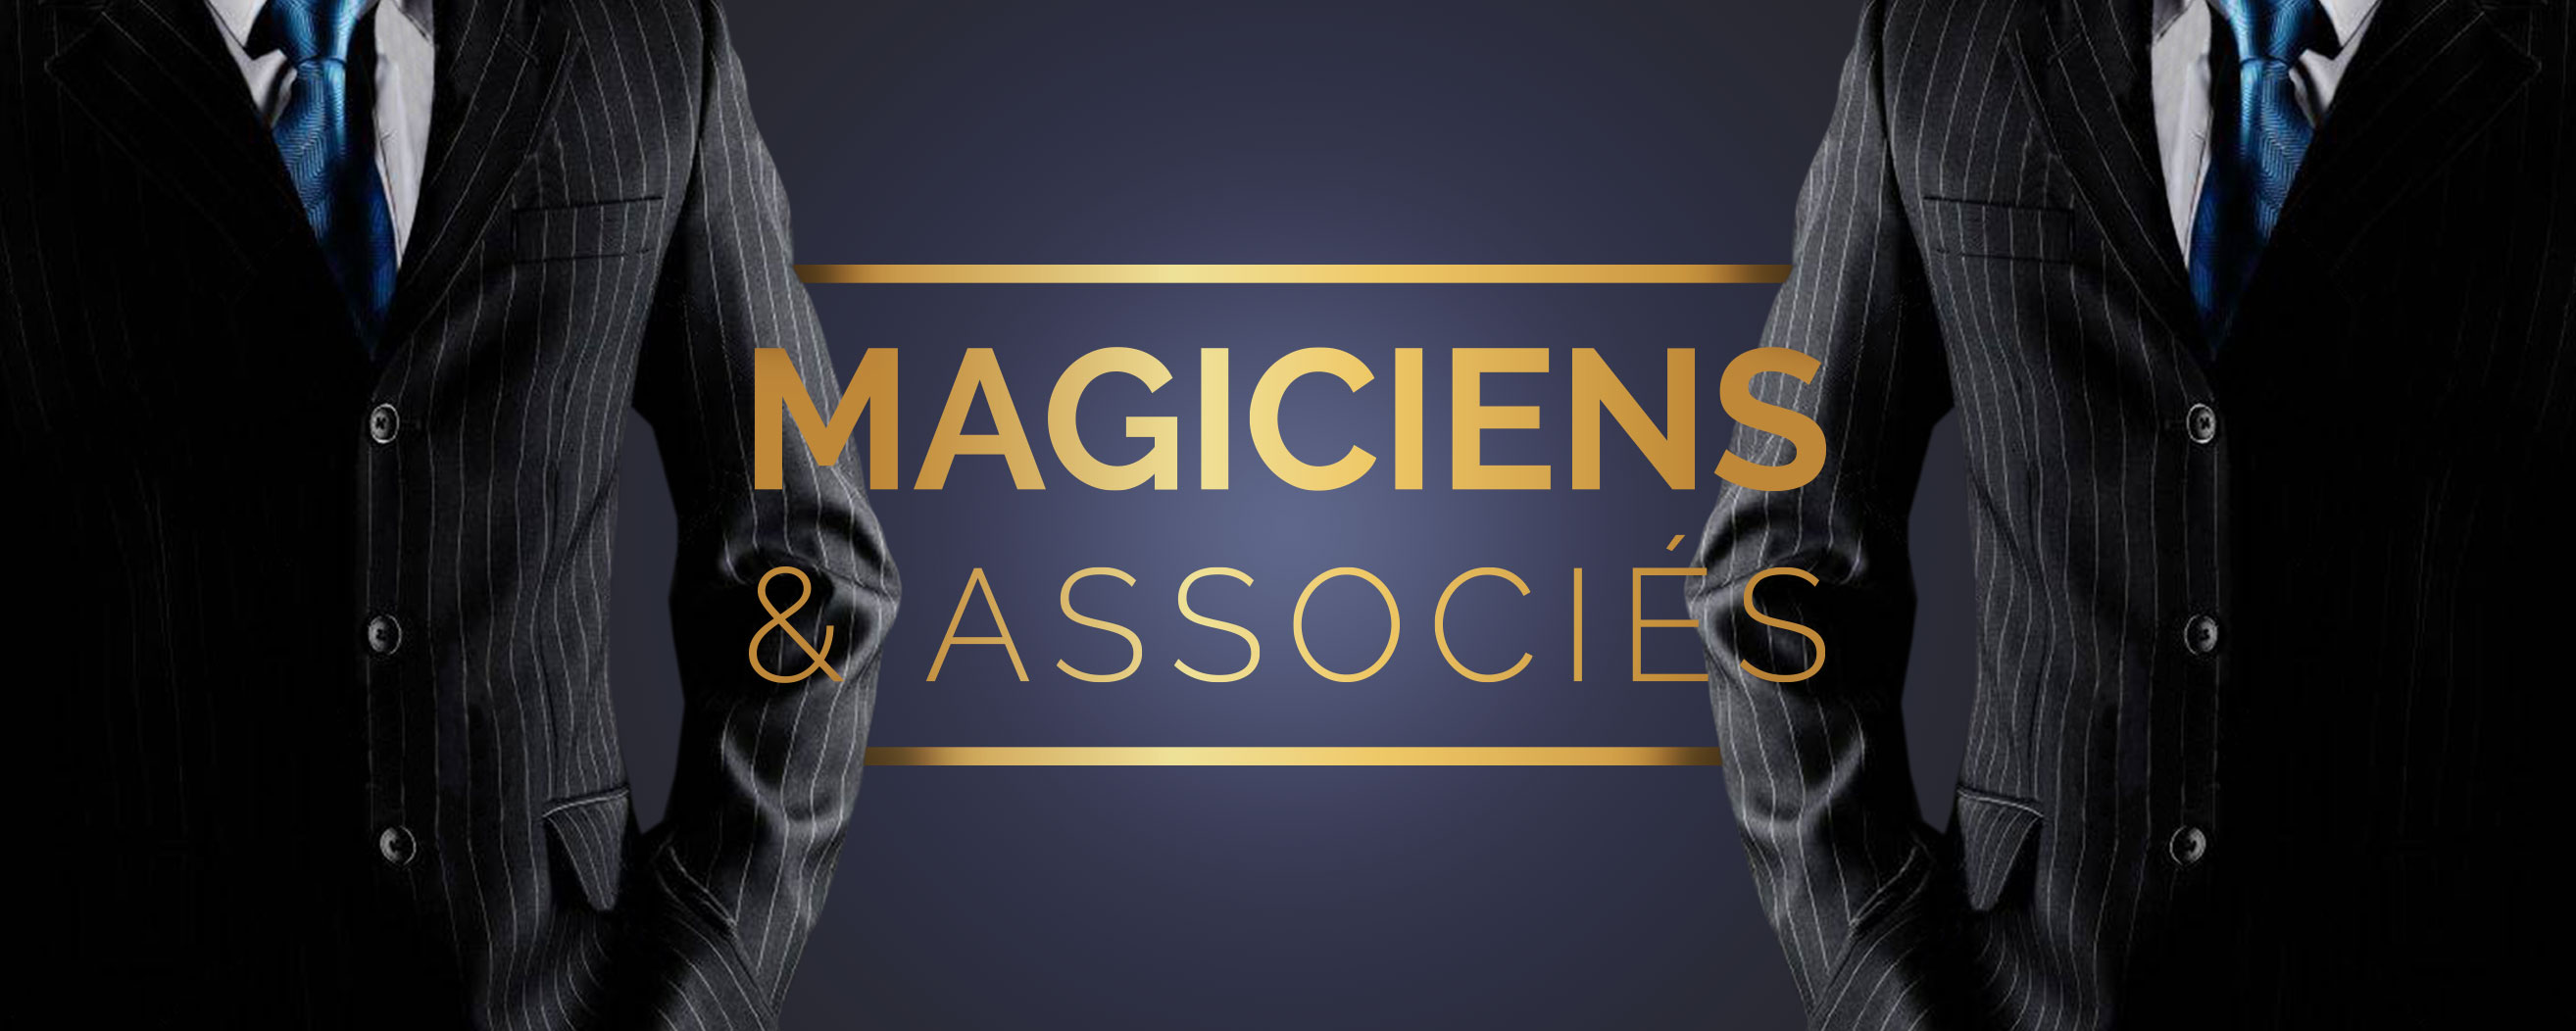 Magiciens & Associés Lyon